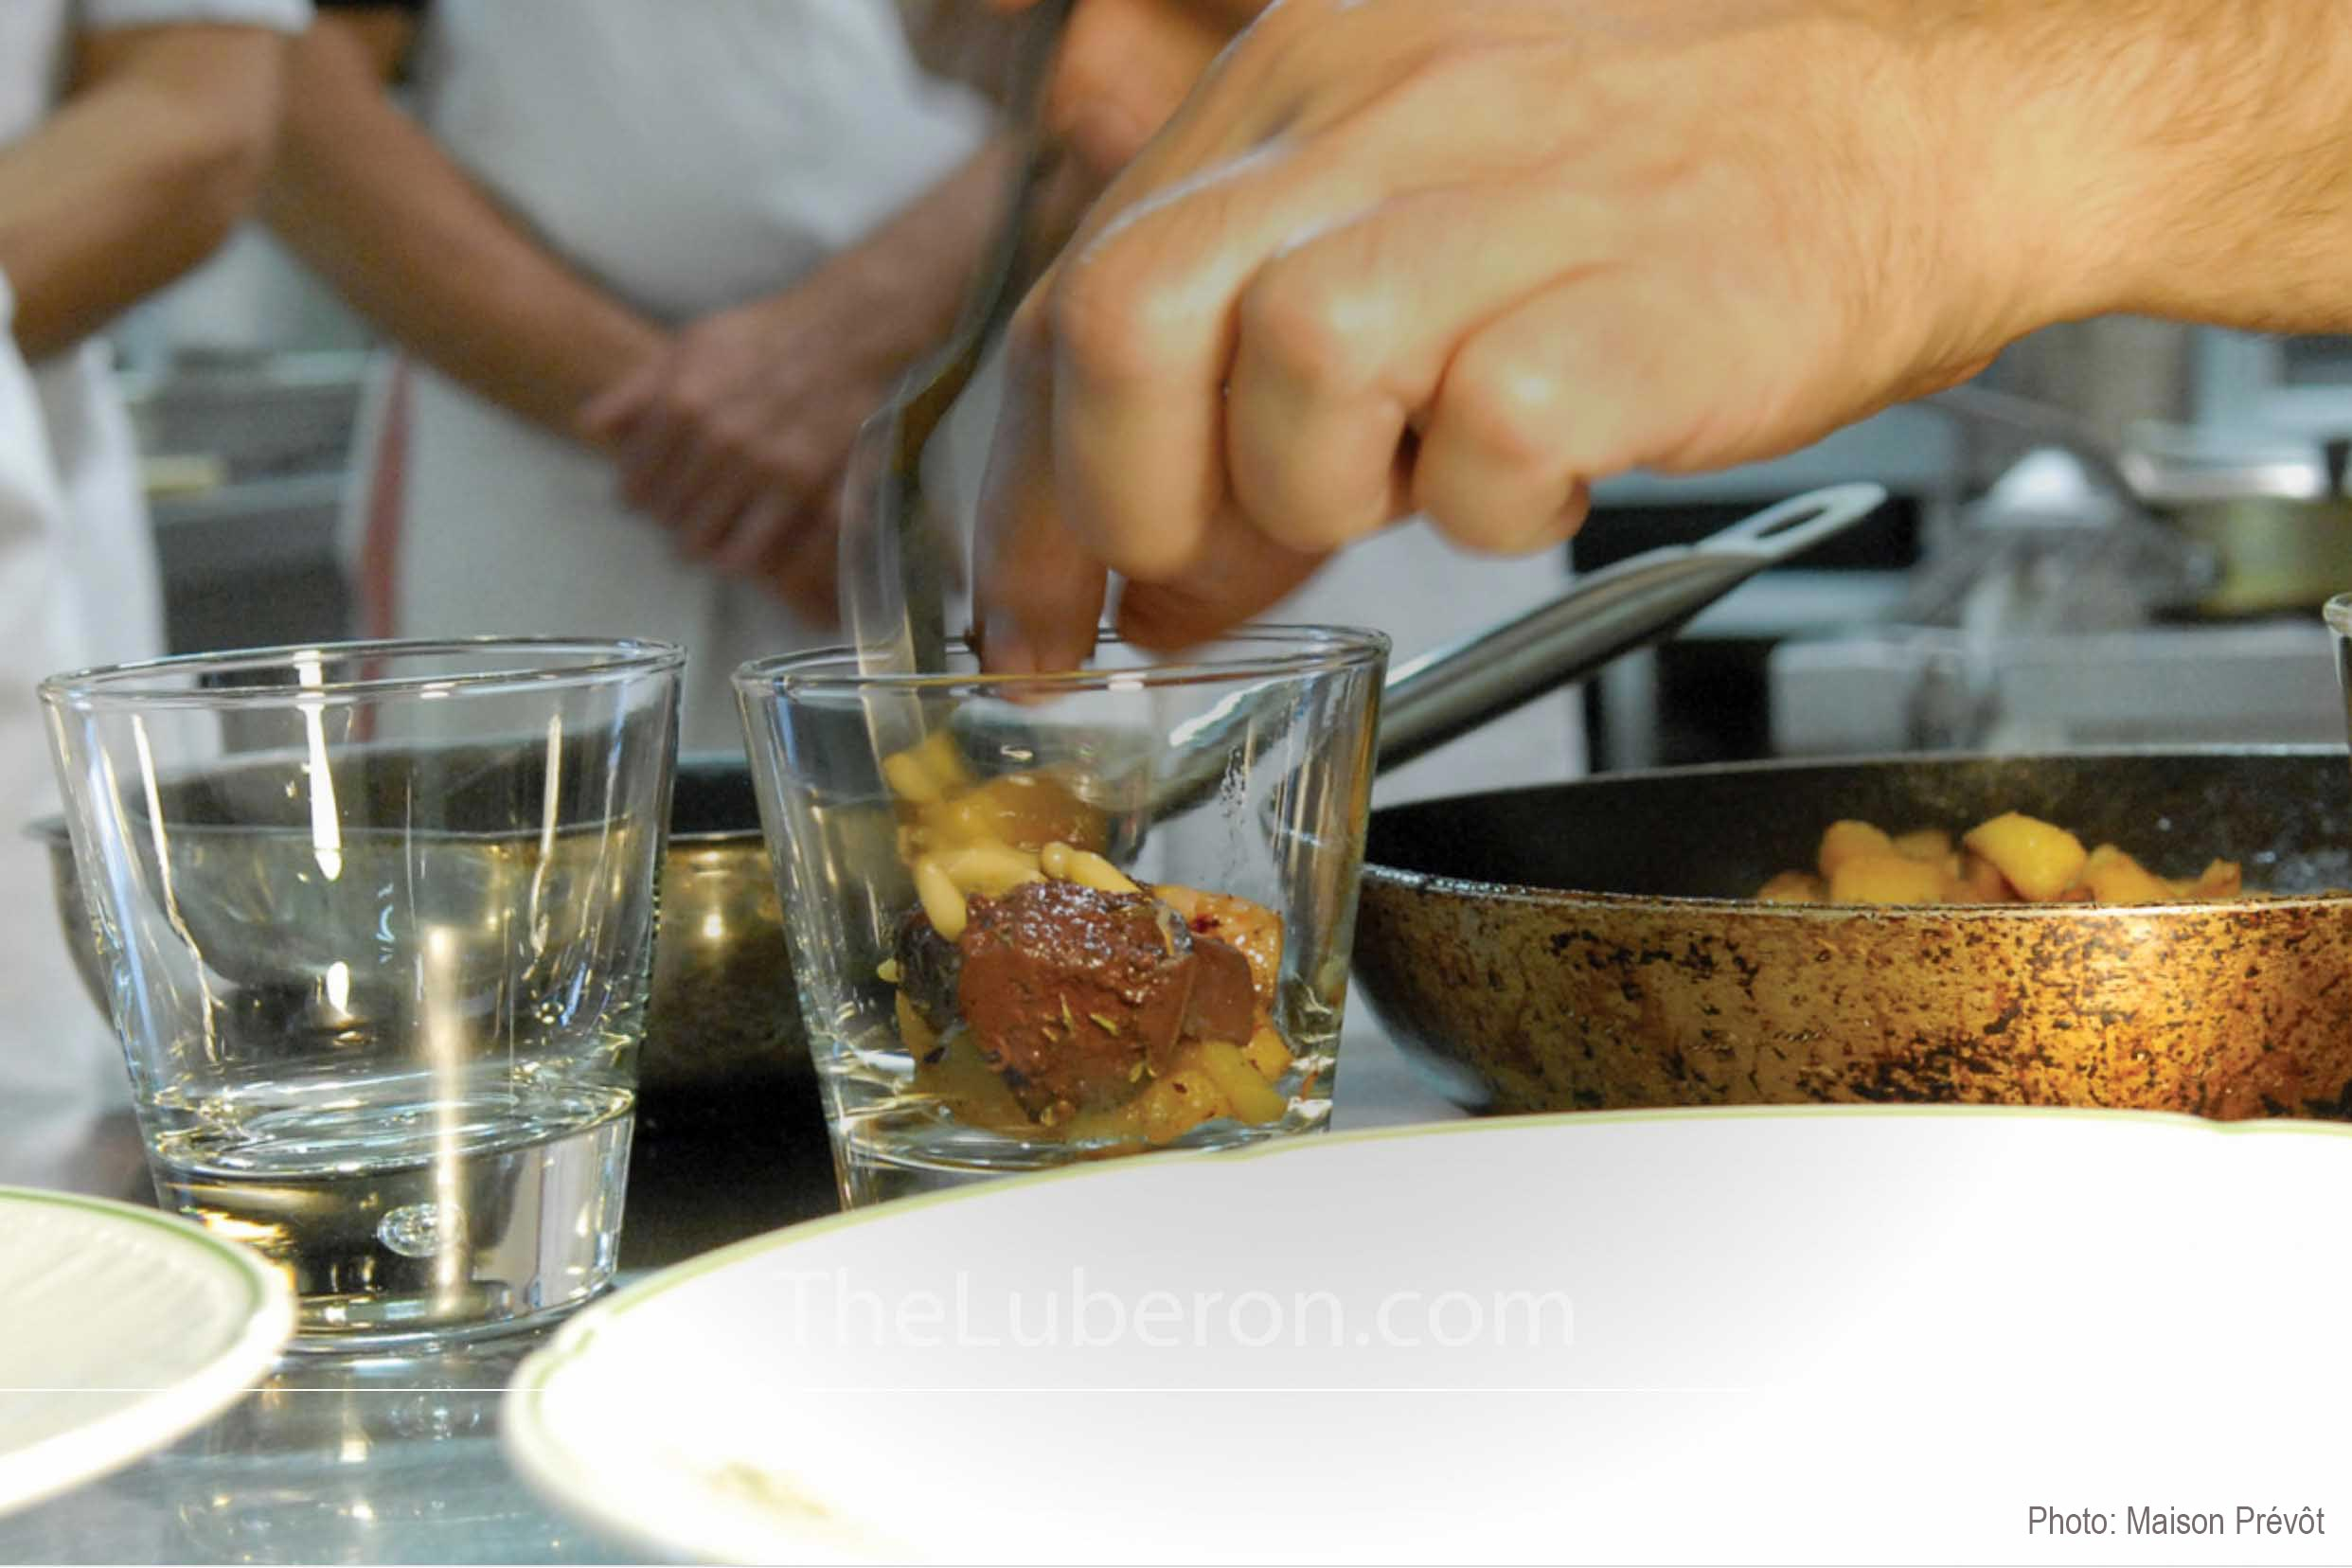 Cookery class at Maison Prévot